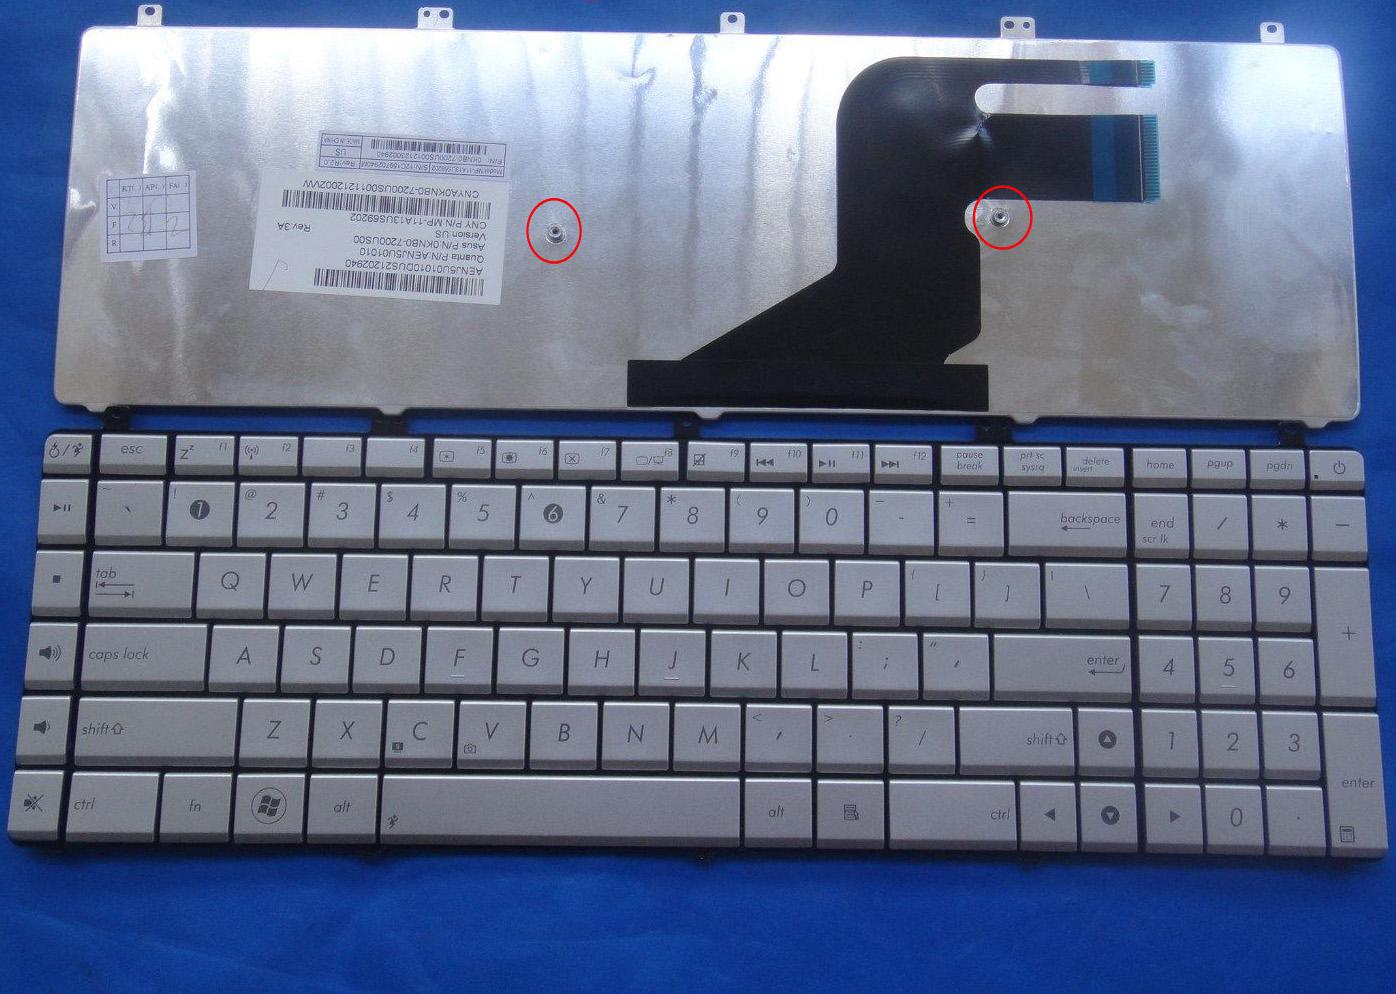 Asus Keyboard English 0KNB0-7200UI00